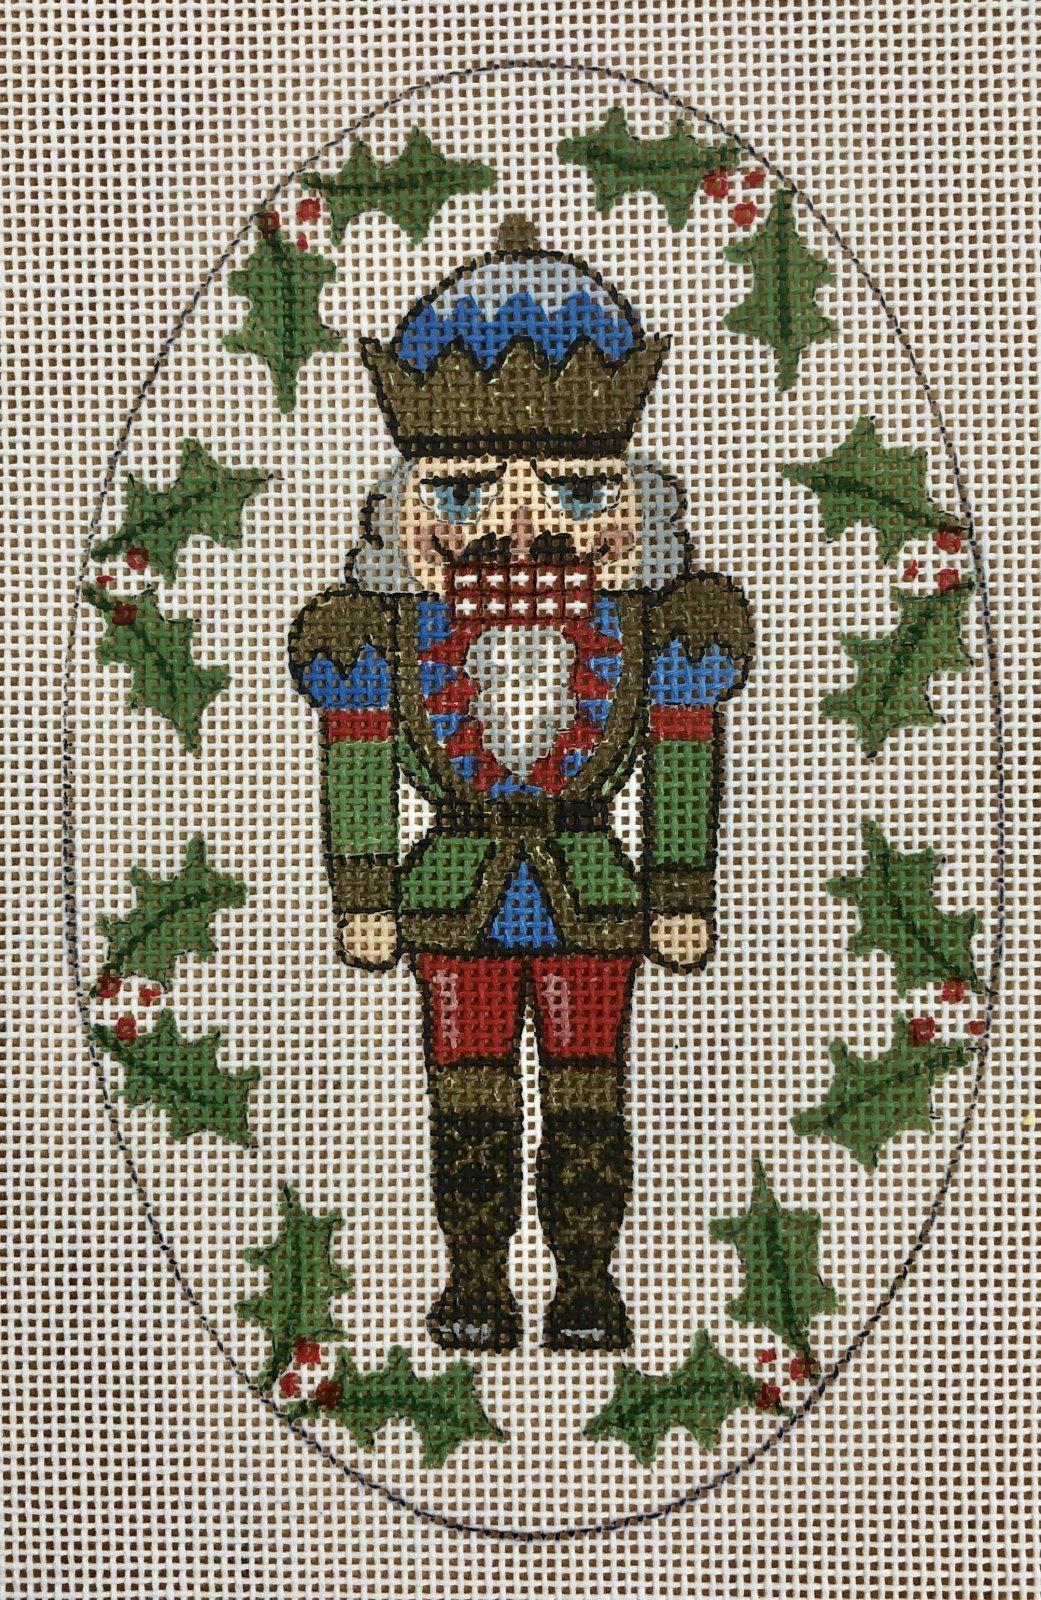 nutcracker ornament, green & blue